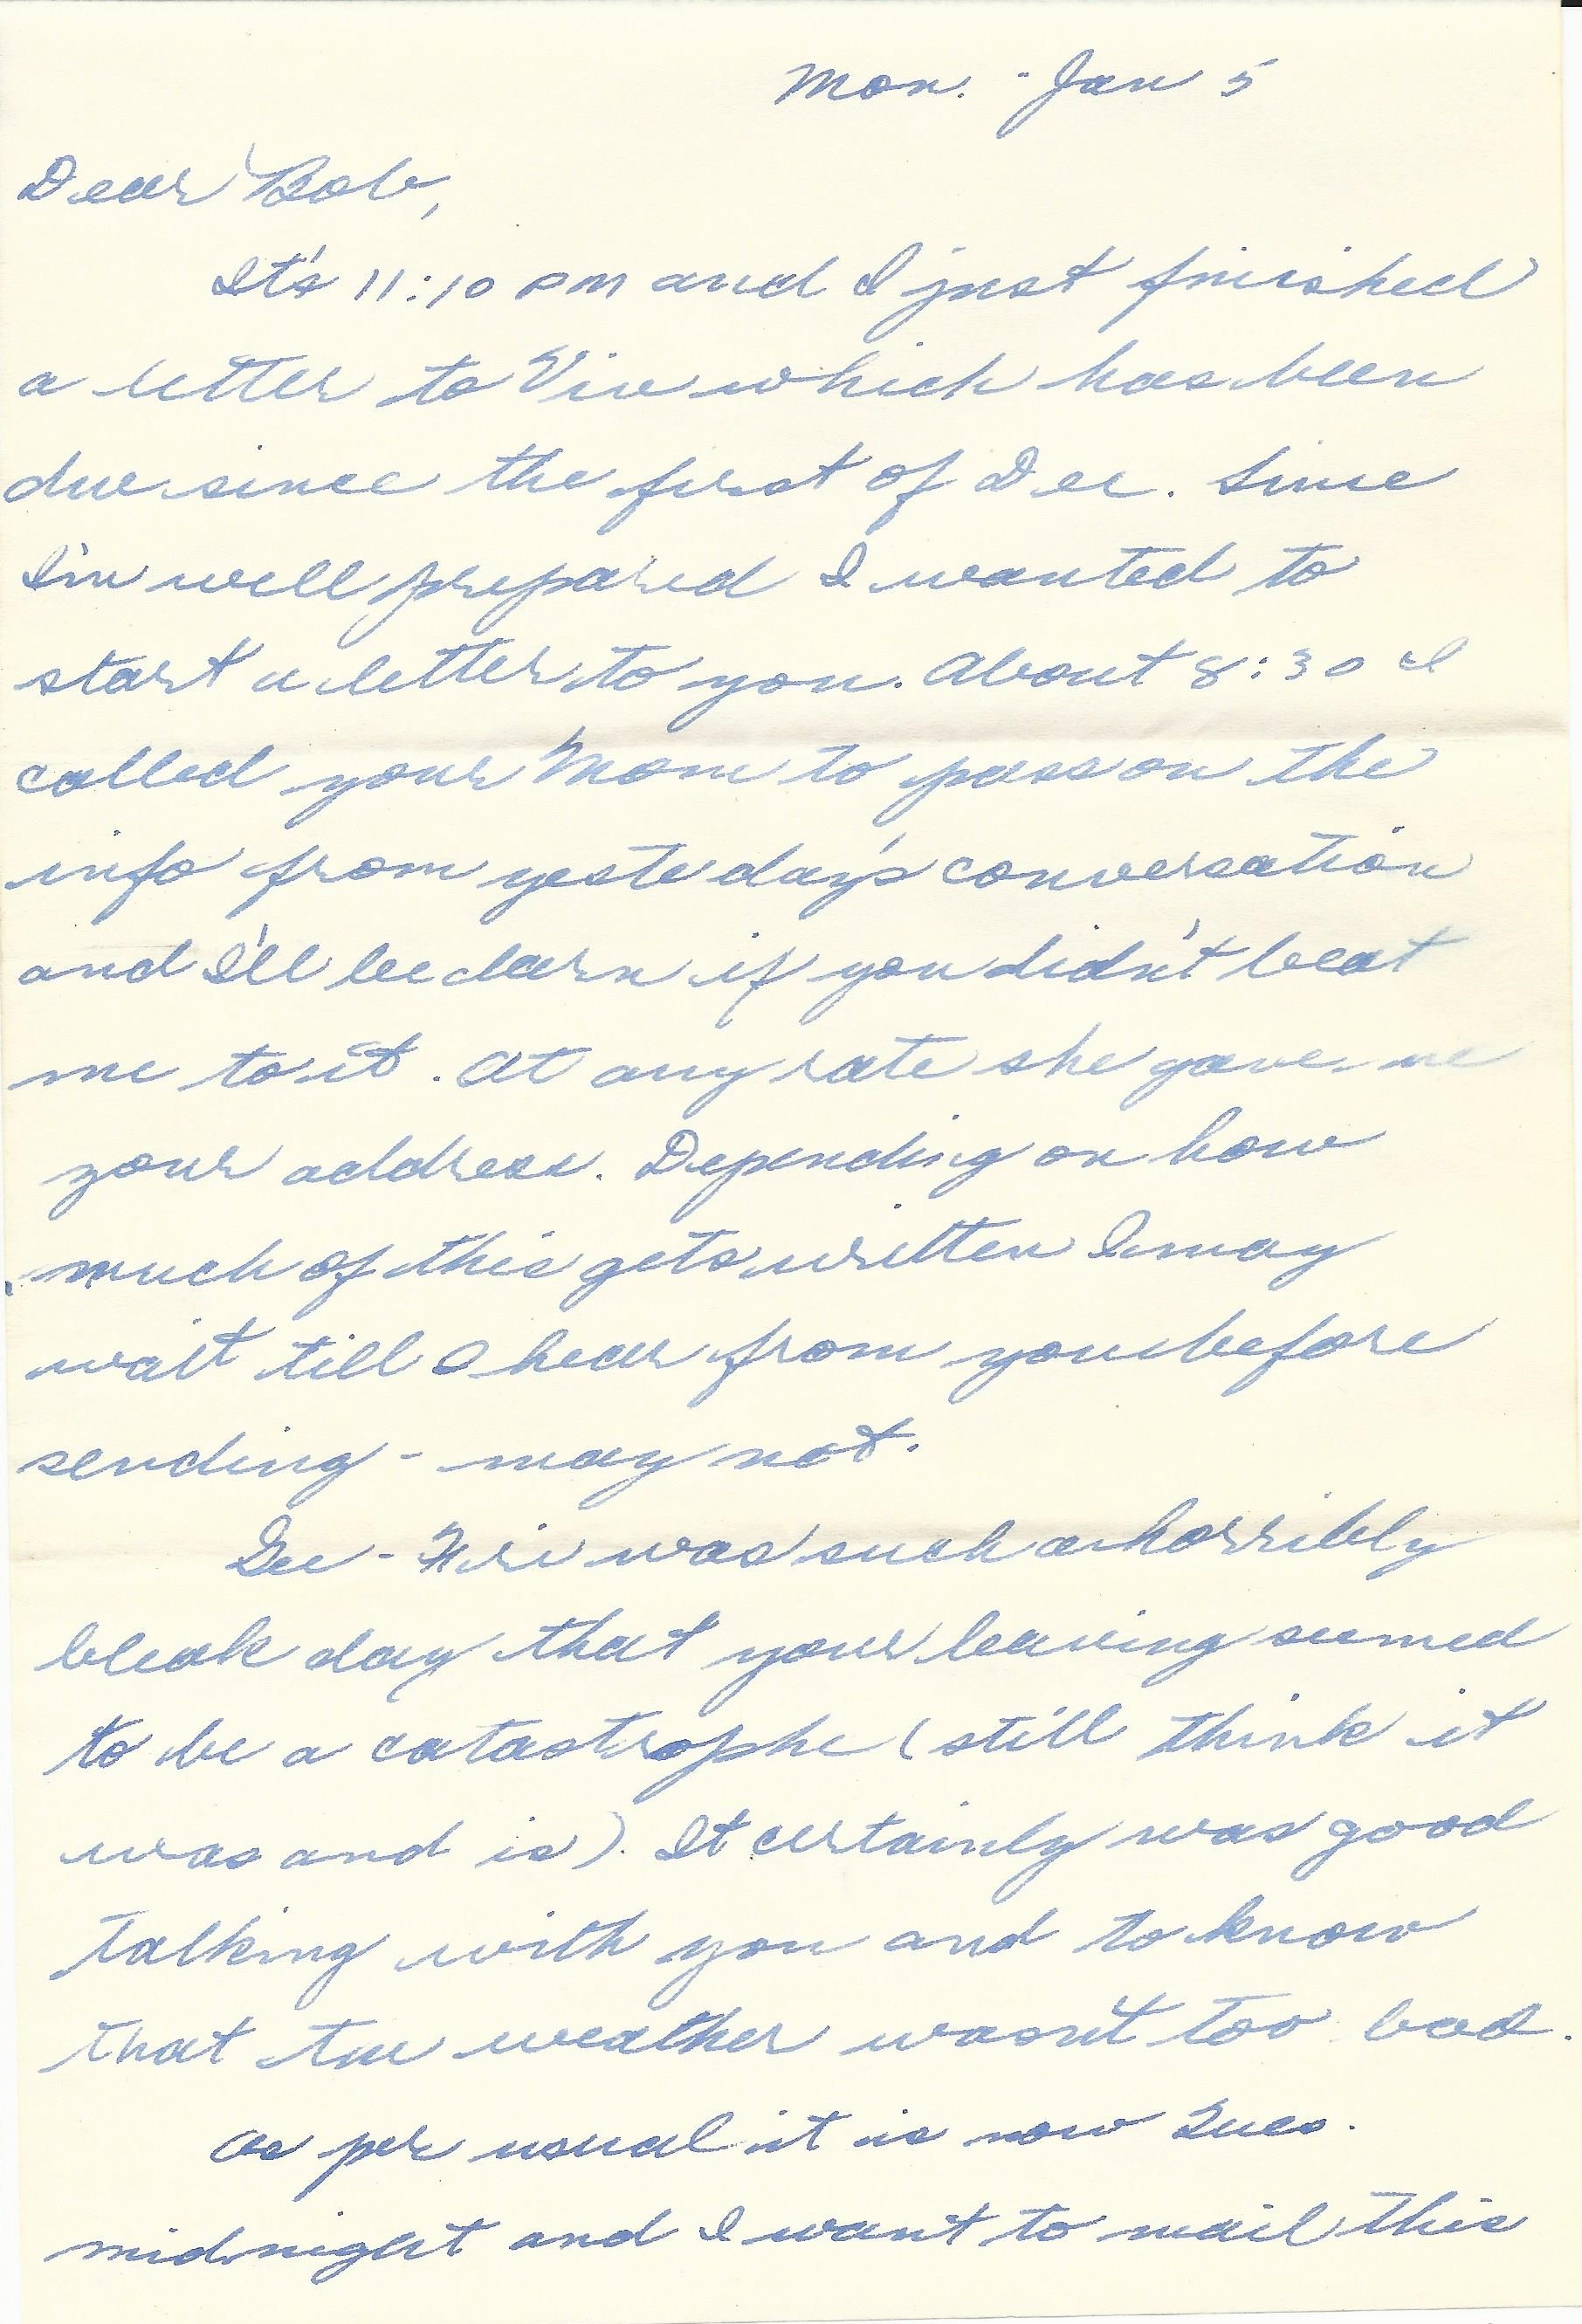 2. Jan. 5, 1953 (Oma)_Page_02.jpg